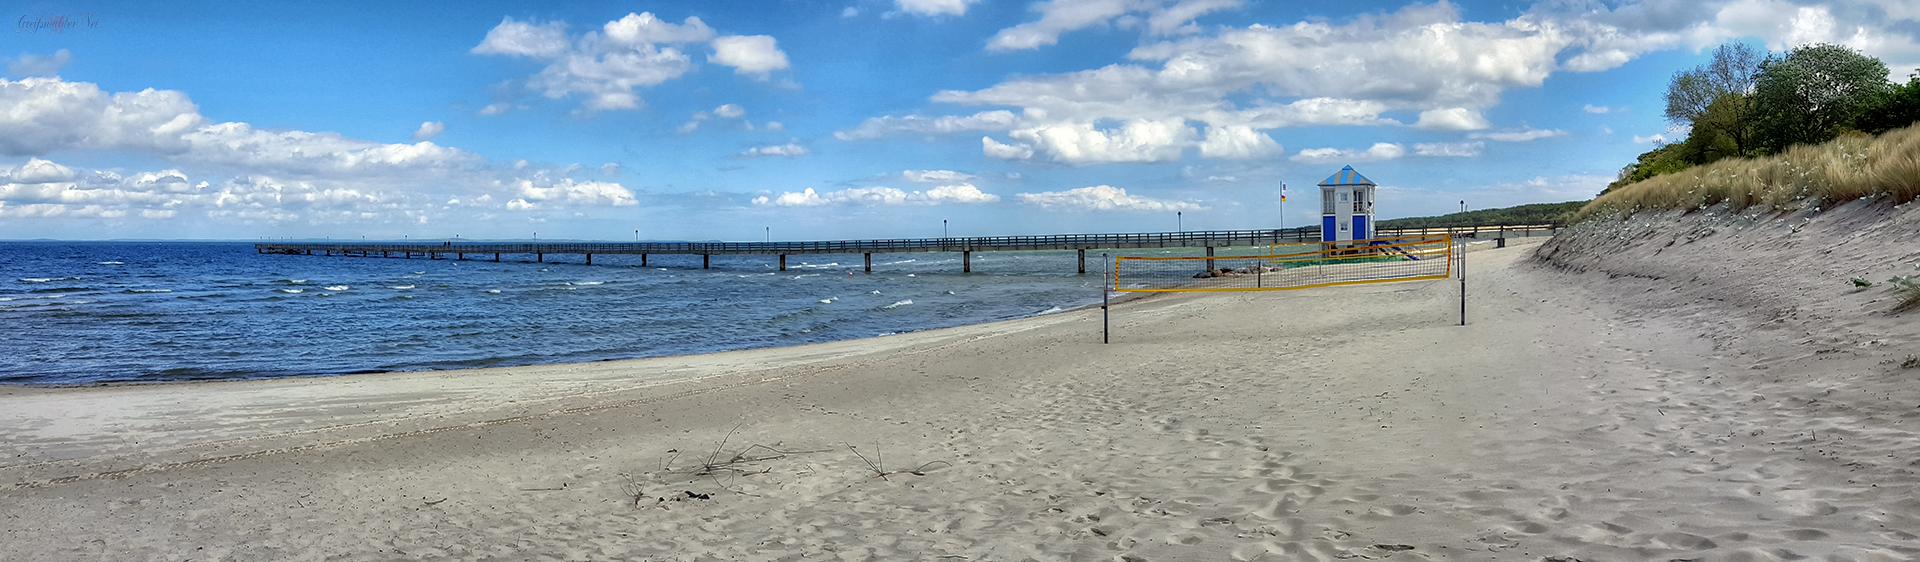 Strand und Seebrücke im Seebad Lubmin